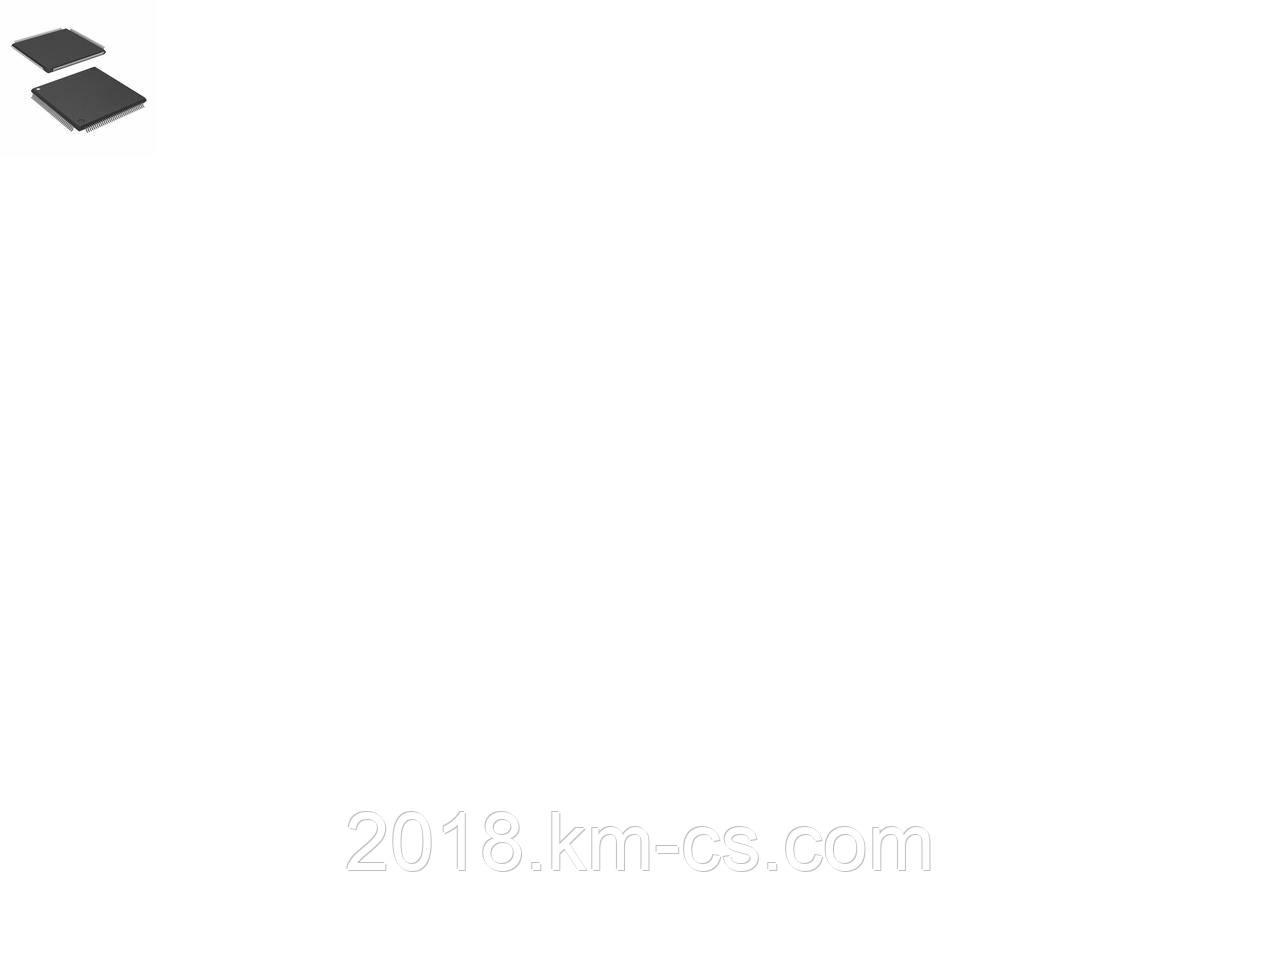 Прогркаммируемая  логика EPM7256ATI144-10 (Altera)